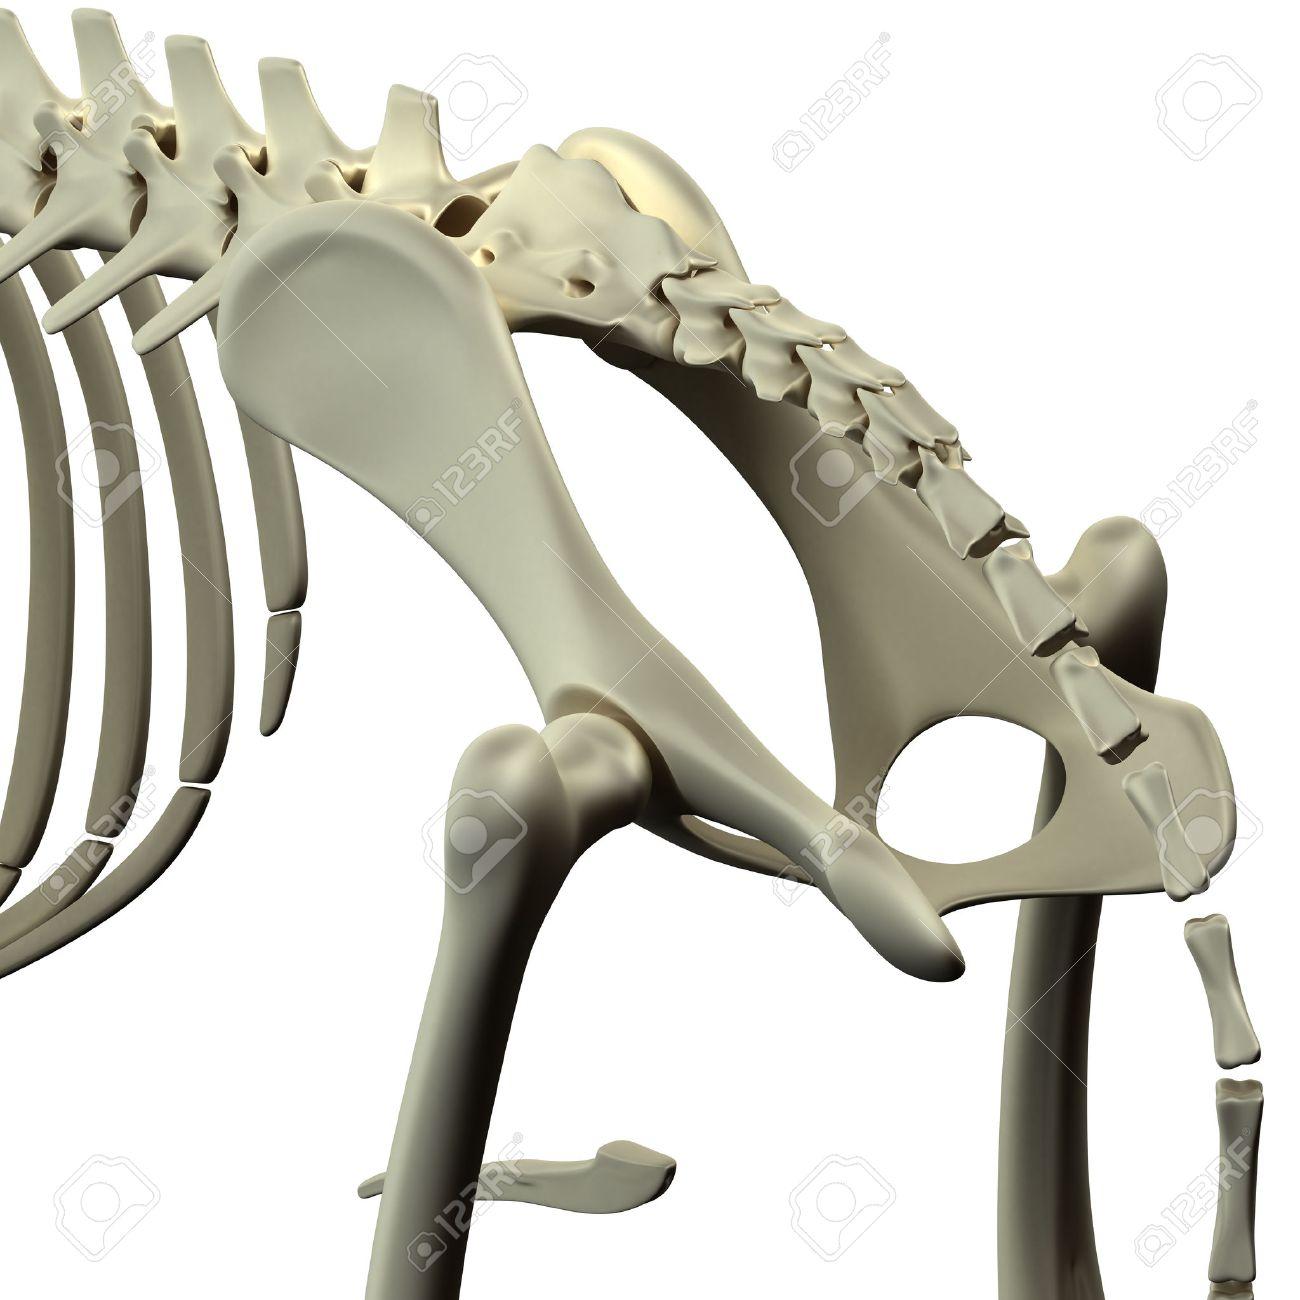 Dog Pelvis Hip Anatomy - Anatomy Of A Canine Pelvis Hip Stock Photo ...